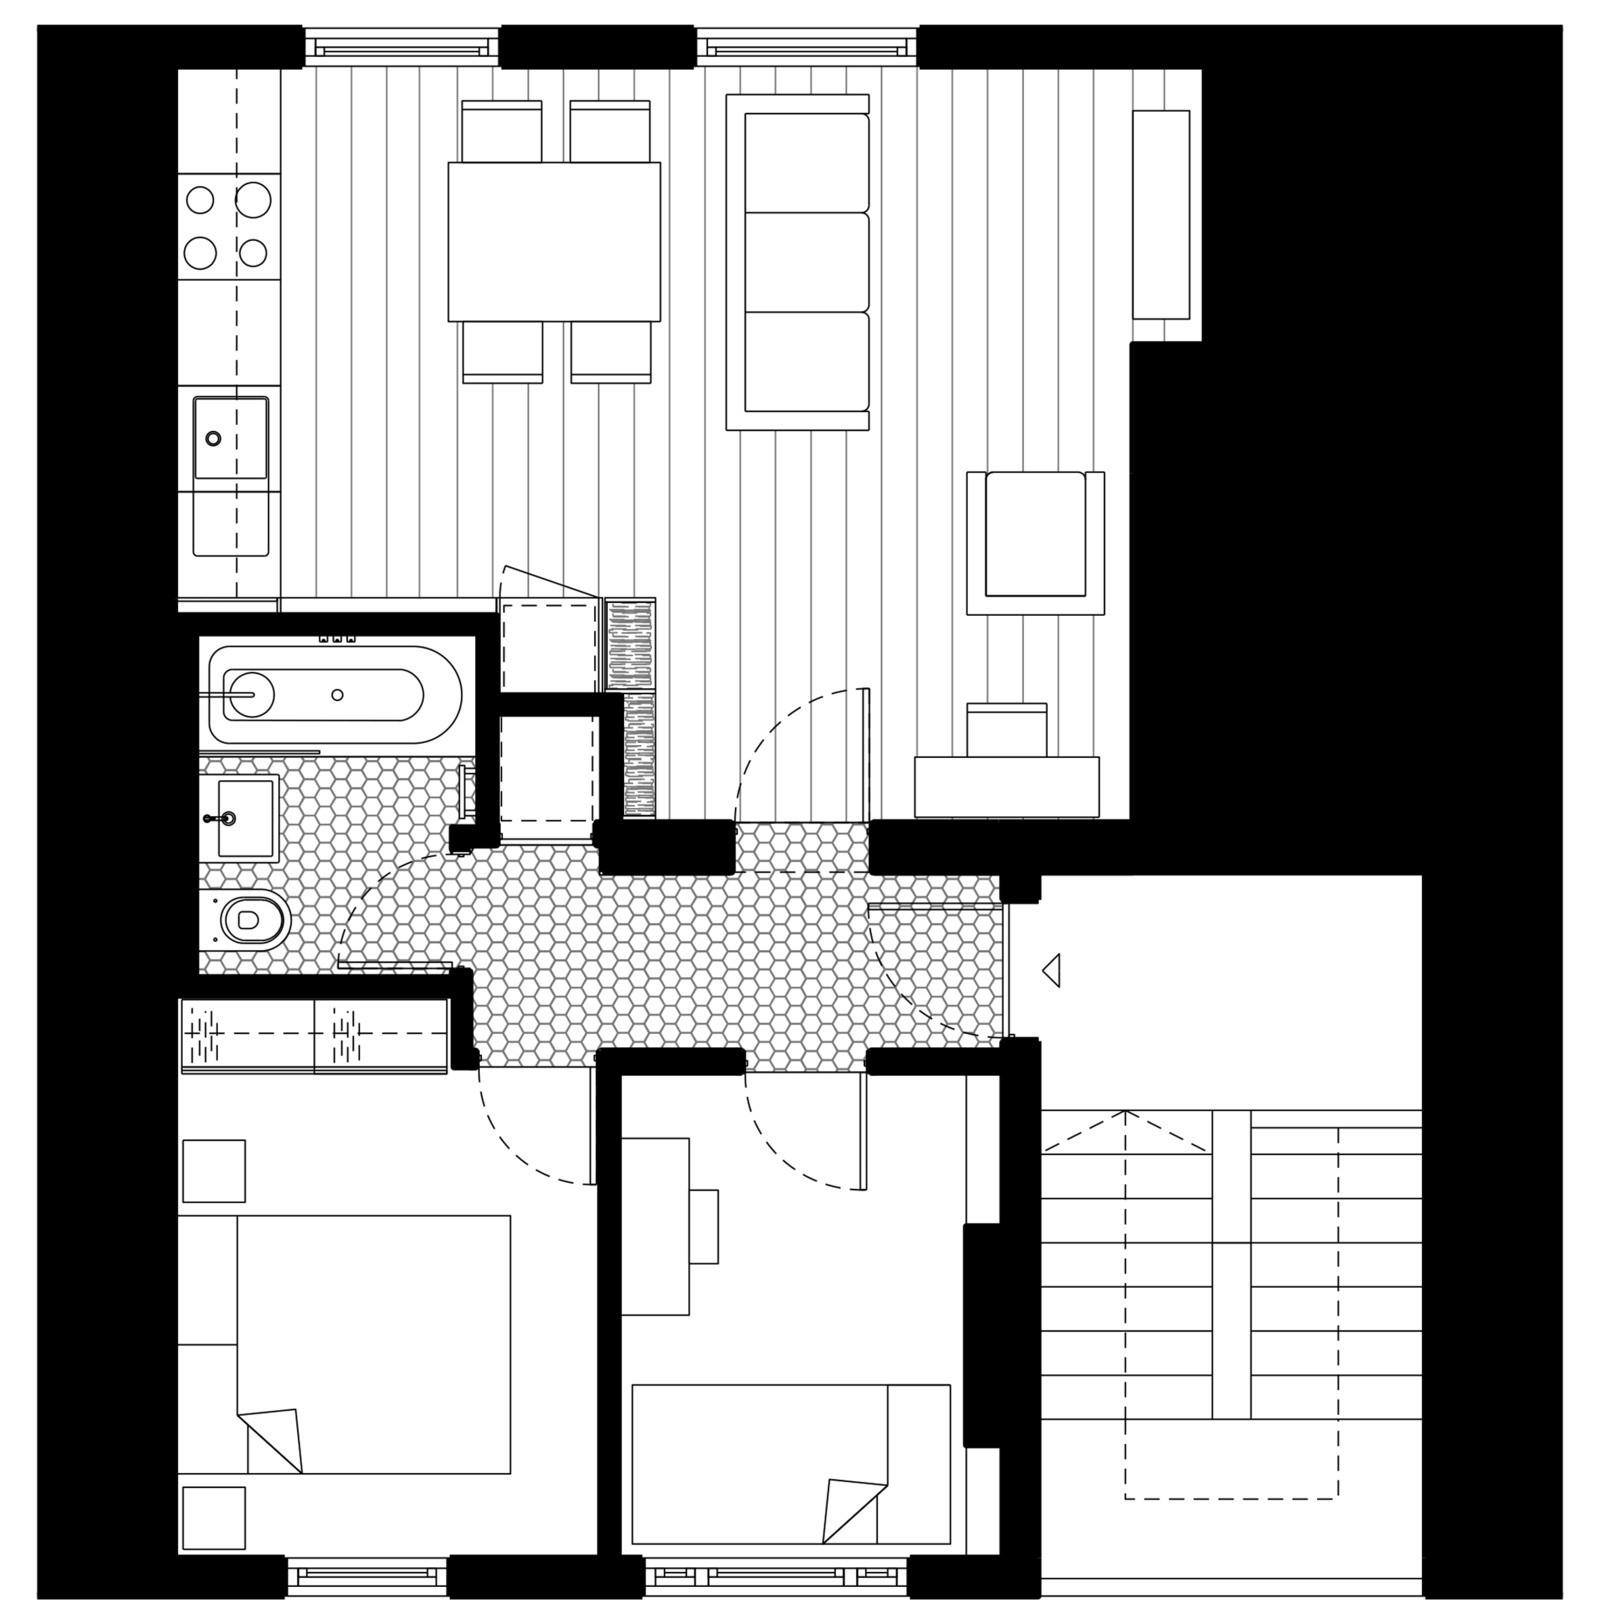 tsveten-i-funktsionalen-interior-za-malak-semeen-apartament-45-m-plan